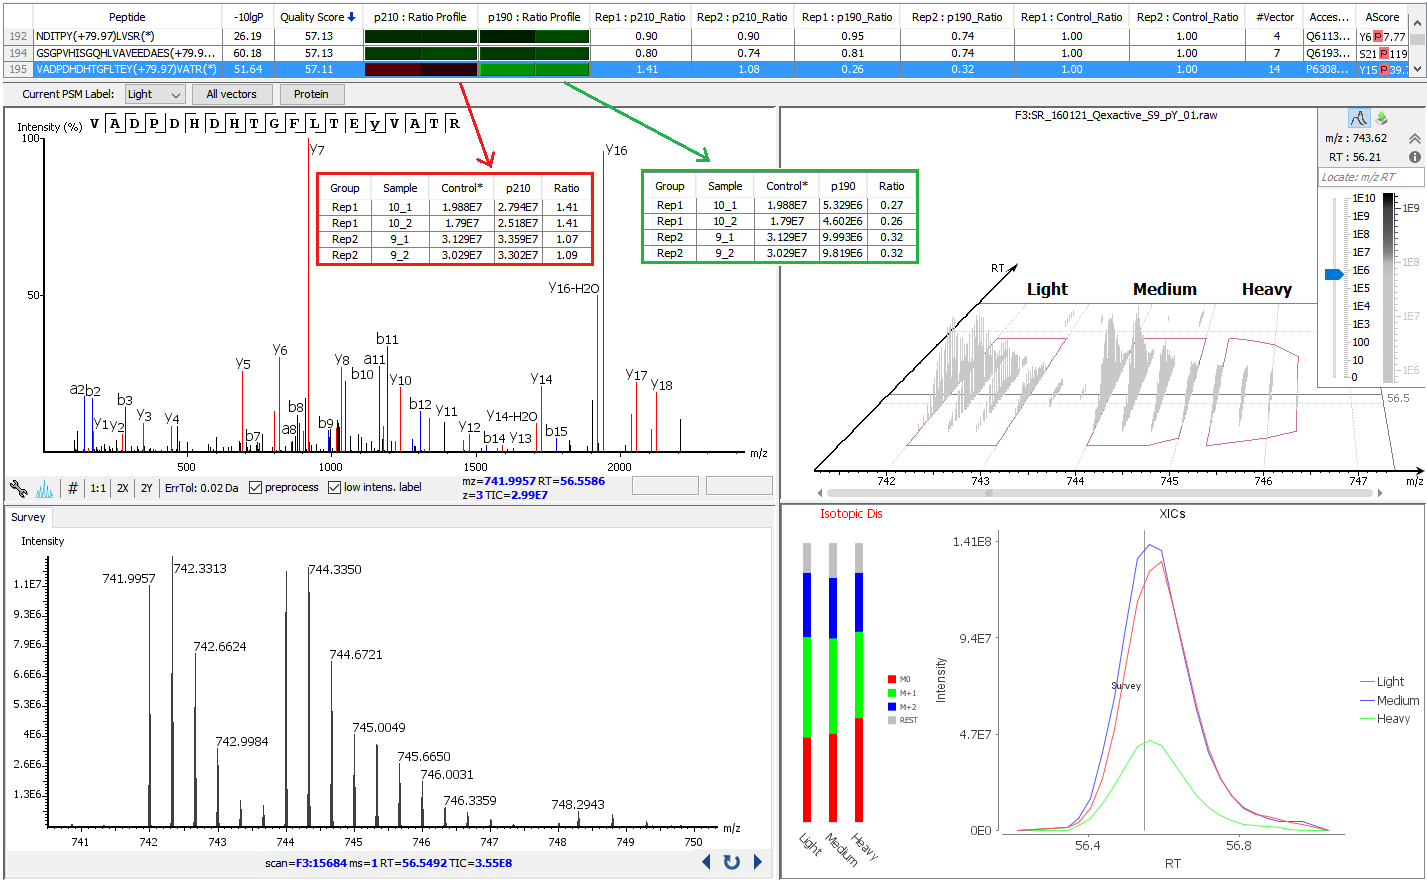 Qualitative Metabolome Analysis of Human Cerebrospinal